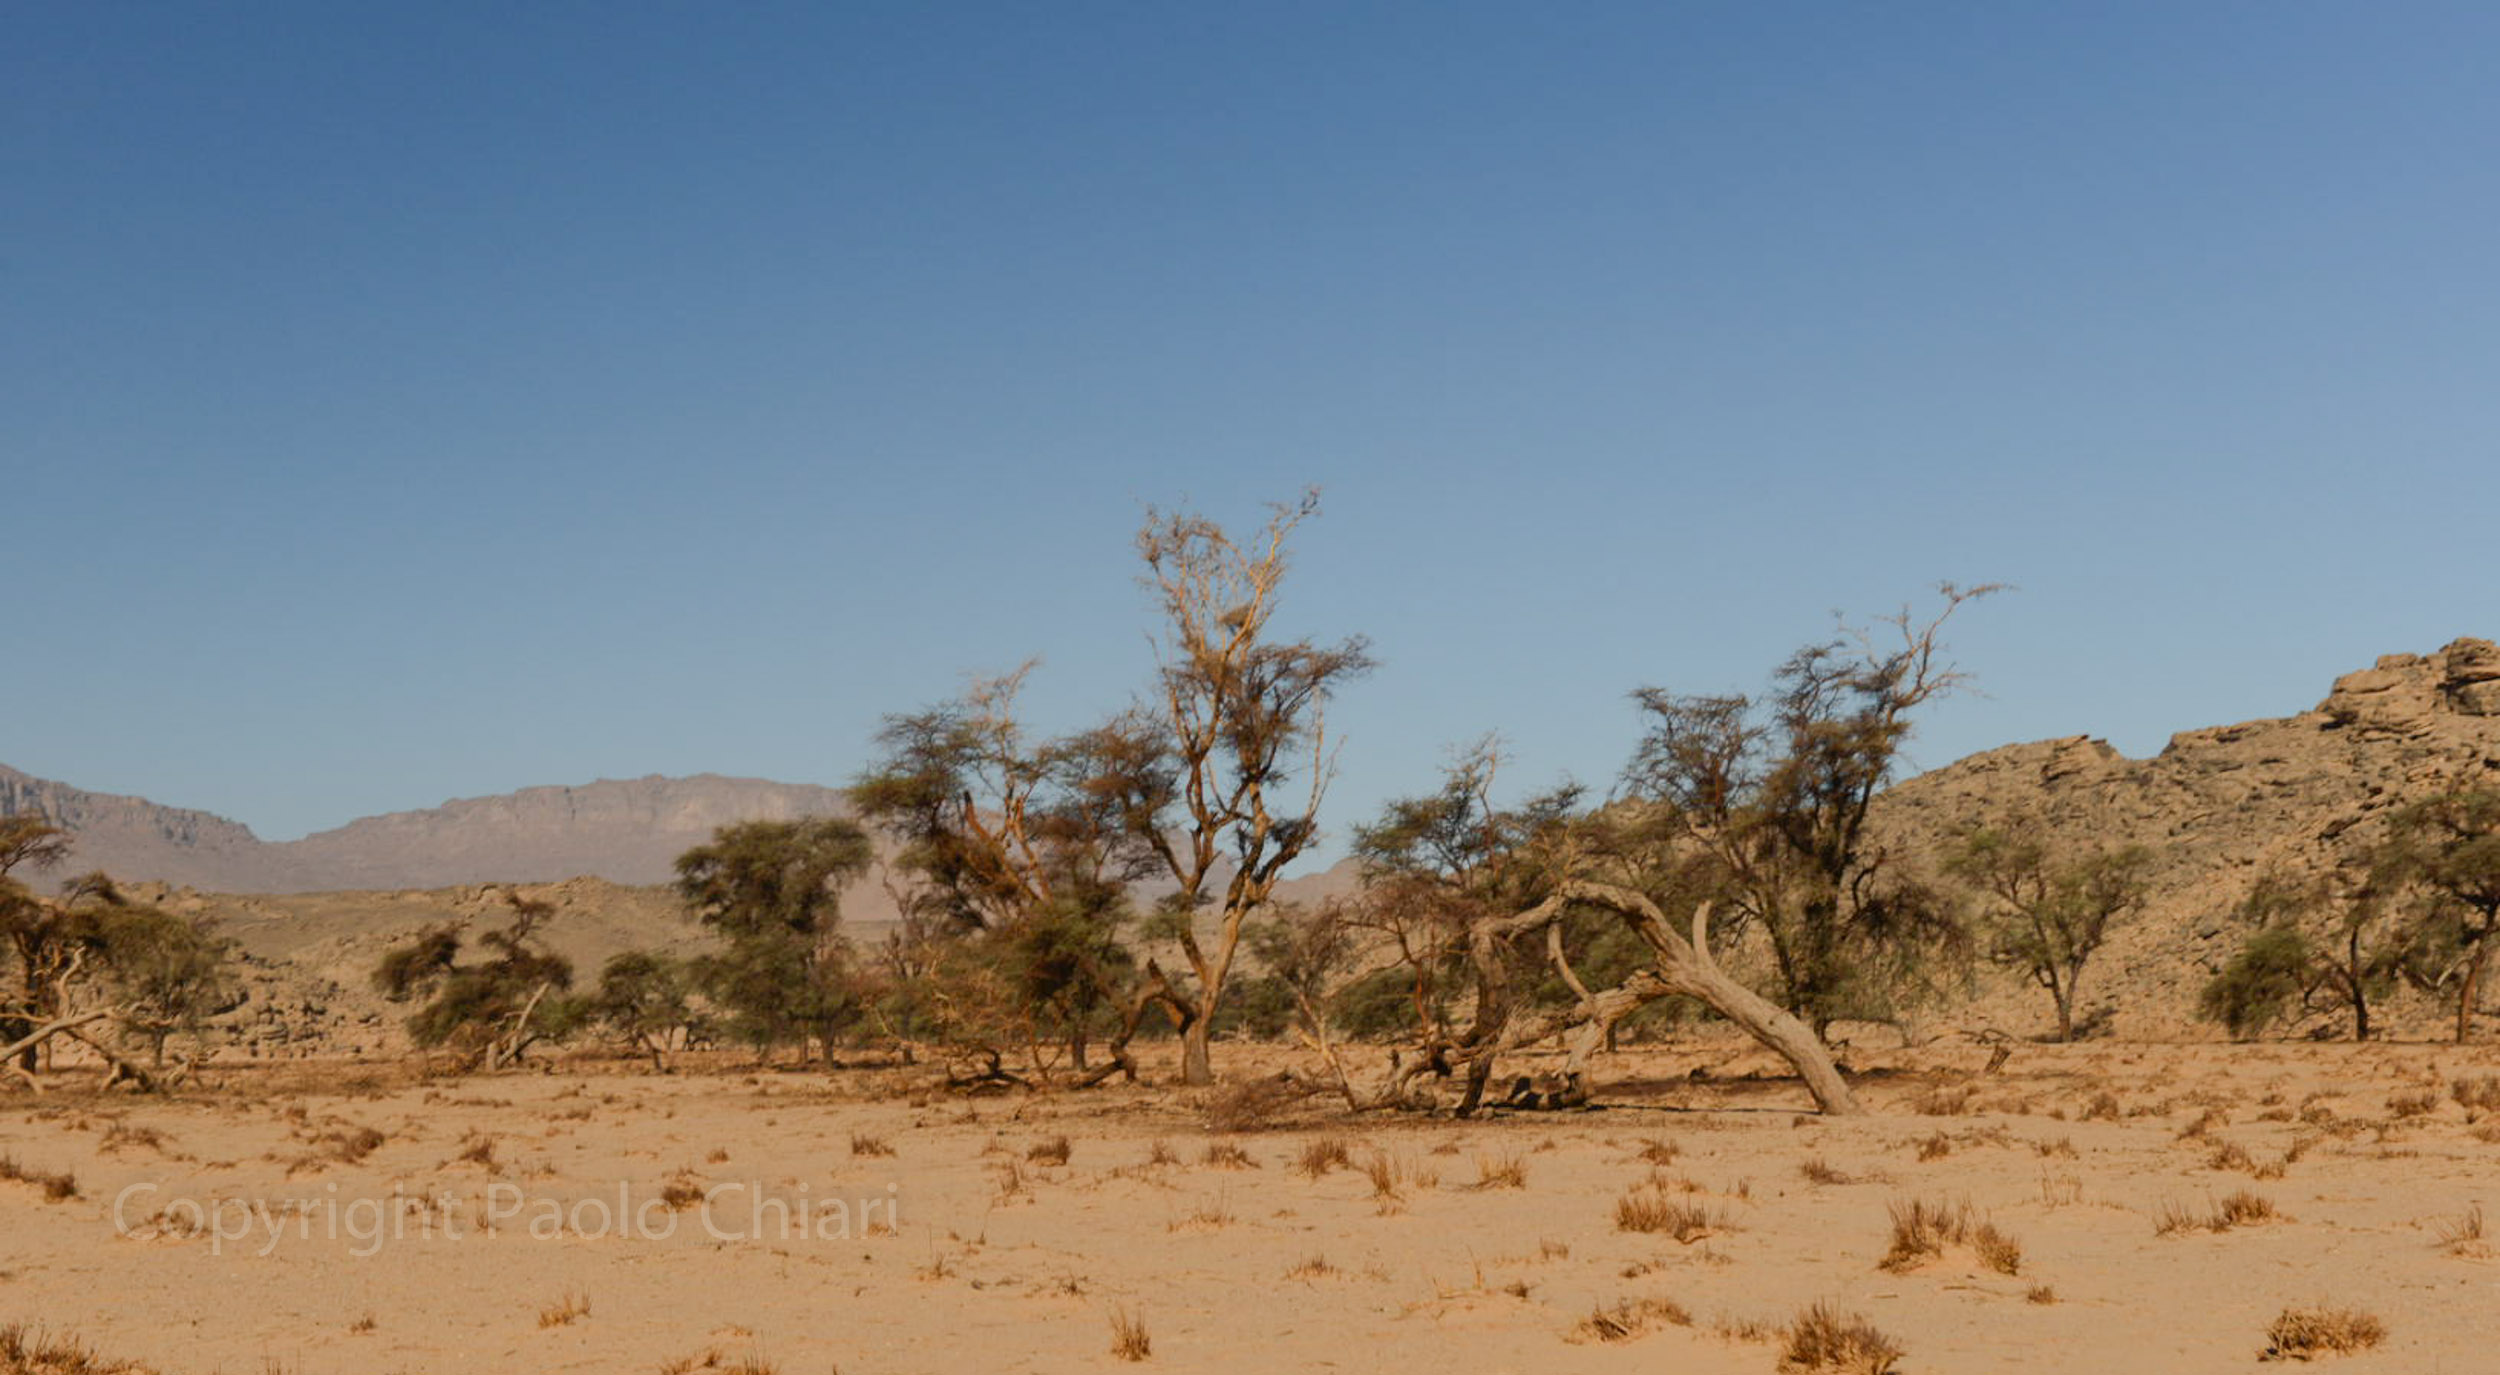 Sudan2013_1142